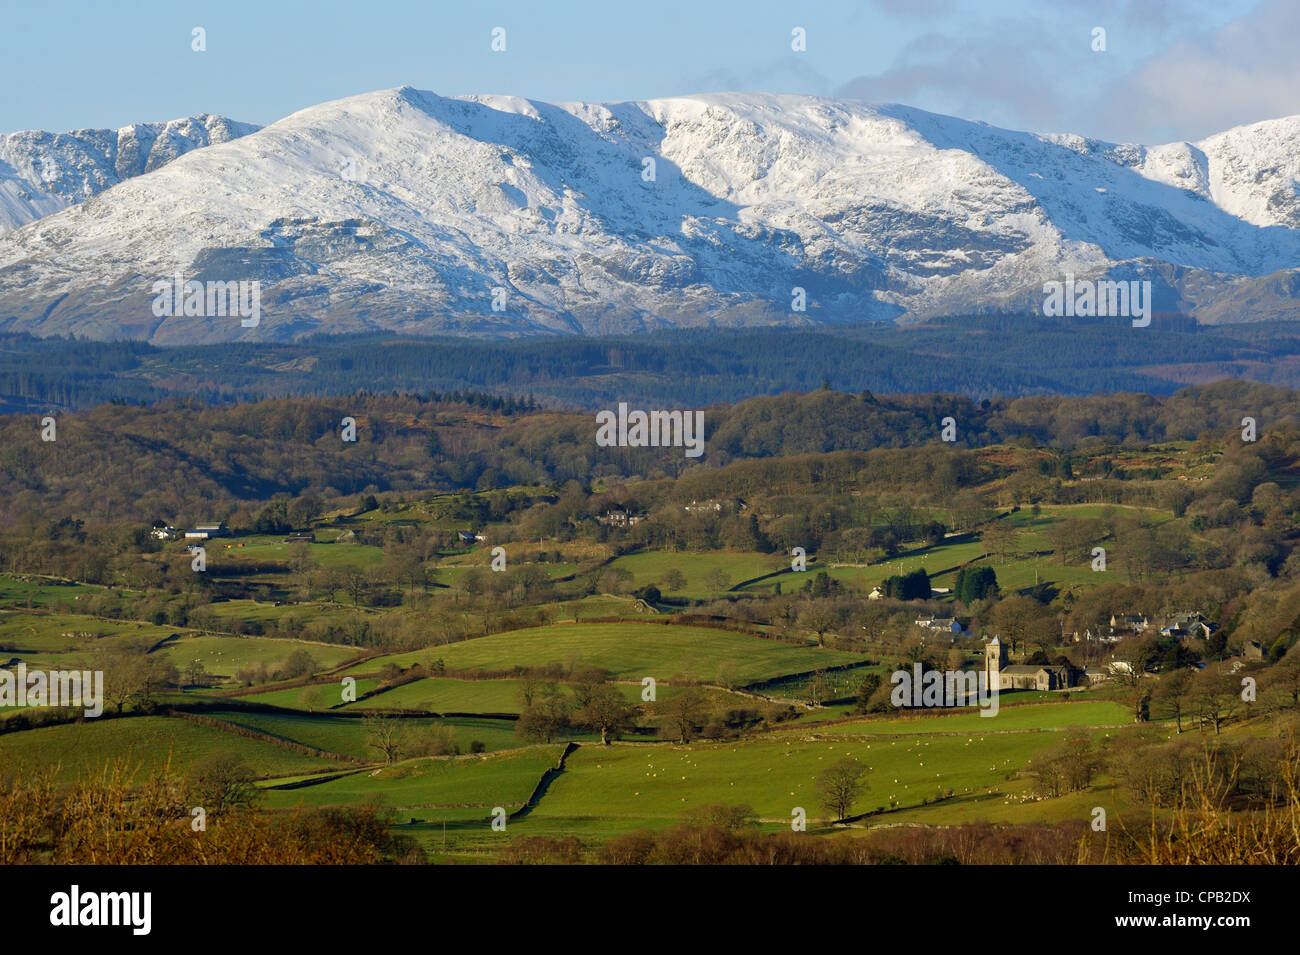 the-lyth-valley-crosthwaite-and-the-coniston-fells-cumbria-england-CPB2DX.jpg